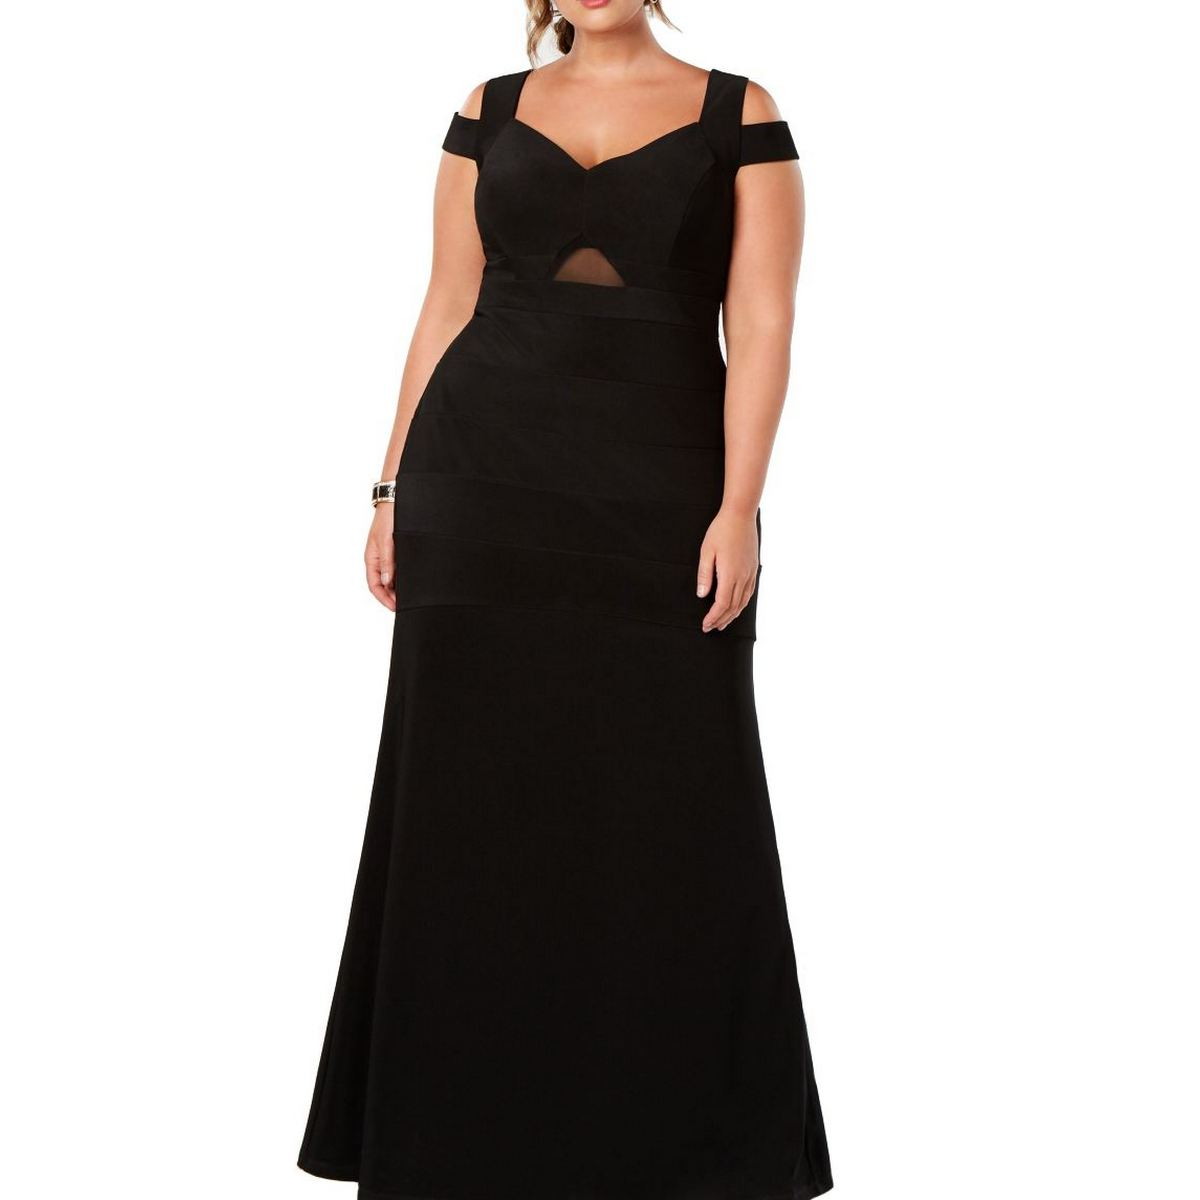 Emerald Sundae Women S Black Plus Size Cold Shoulder Evening Gown Dress 1x Tedo Ebay